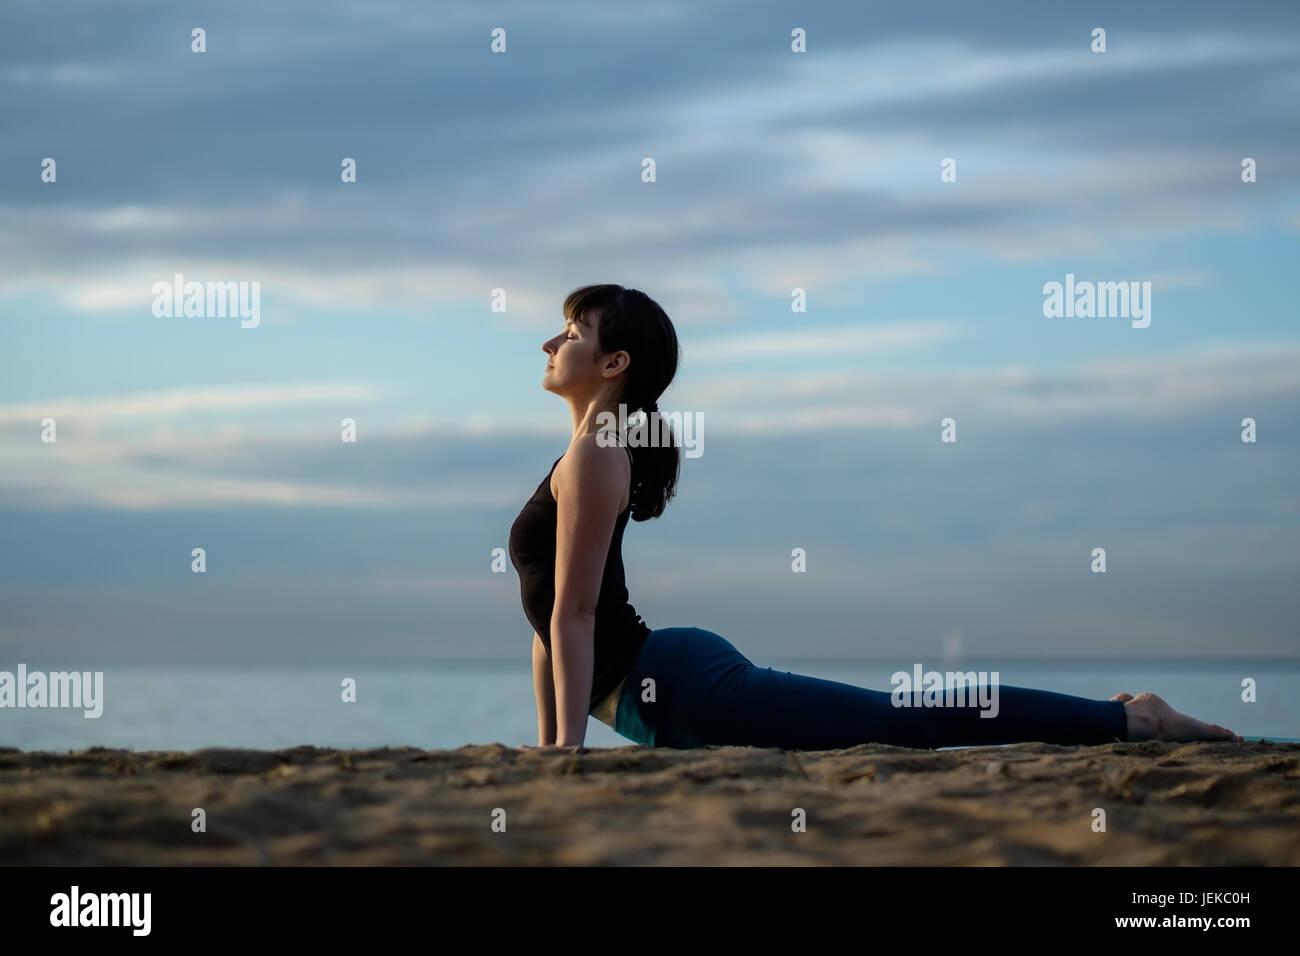 Yoga asana outdoors on beach. up facing dog pose - Stock Image